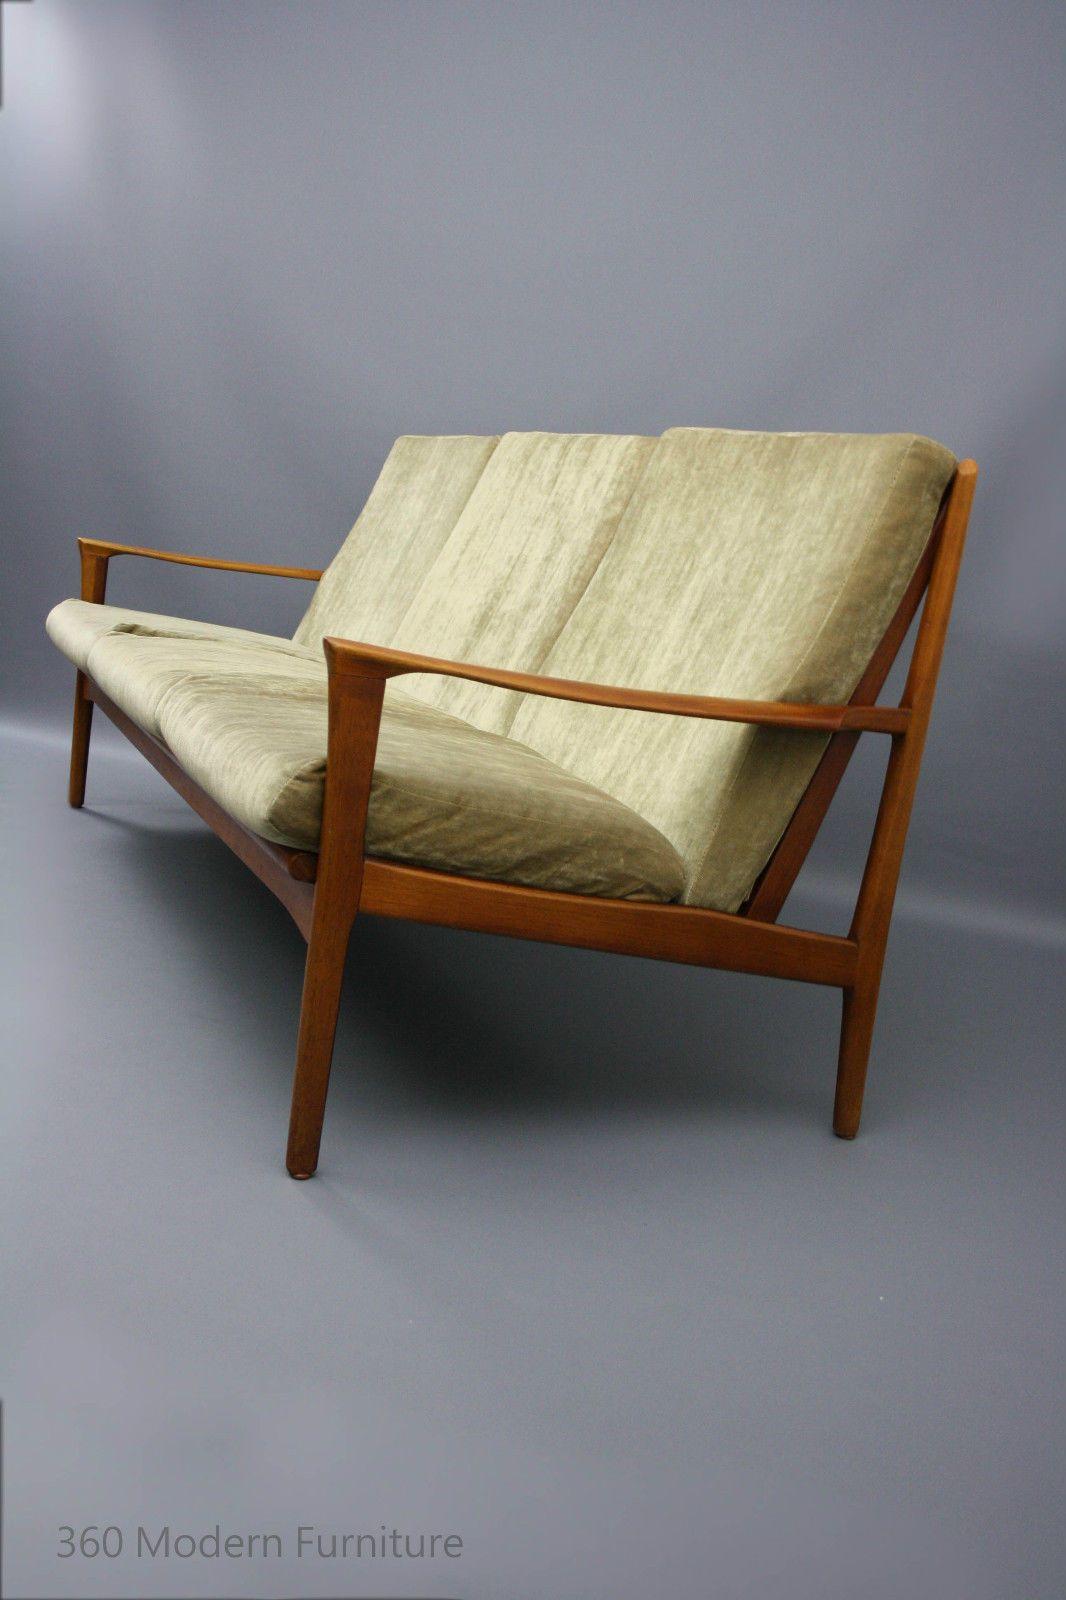 Mid century modern lounge sofa 3 seater couch teak retro vintage lounge danish fler era in vic 360 modern furniture ebay